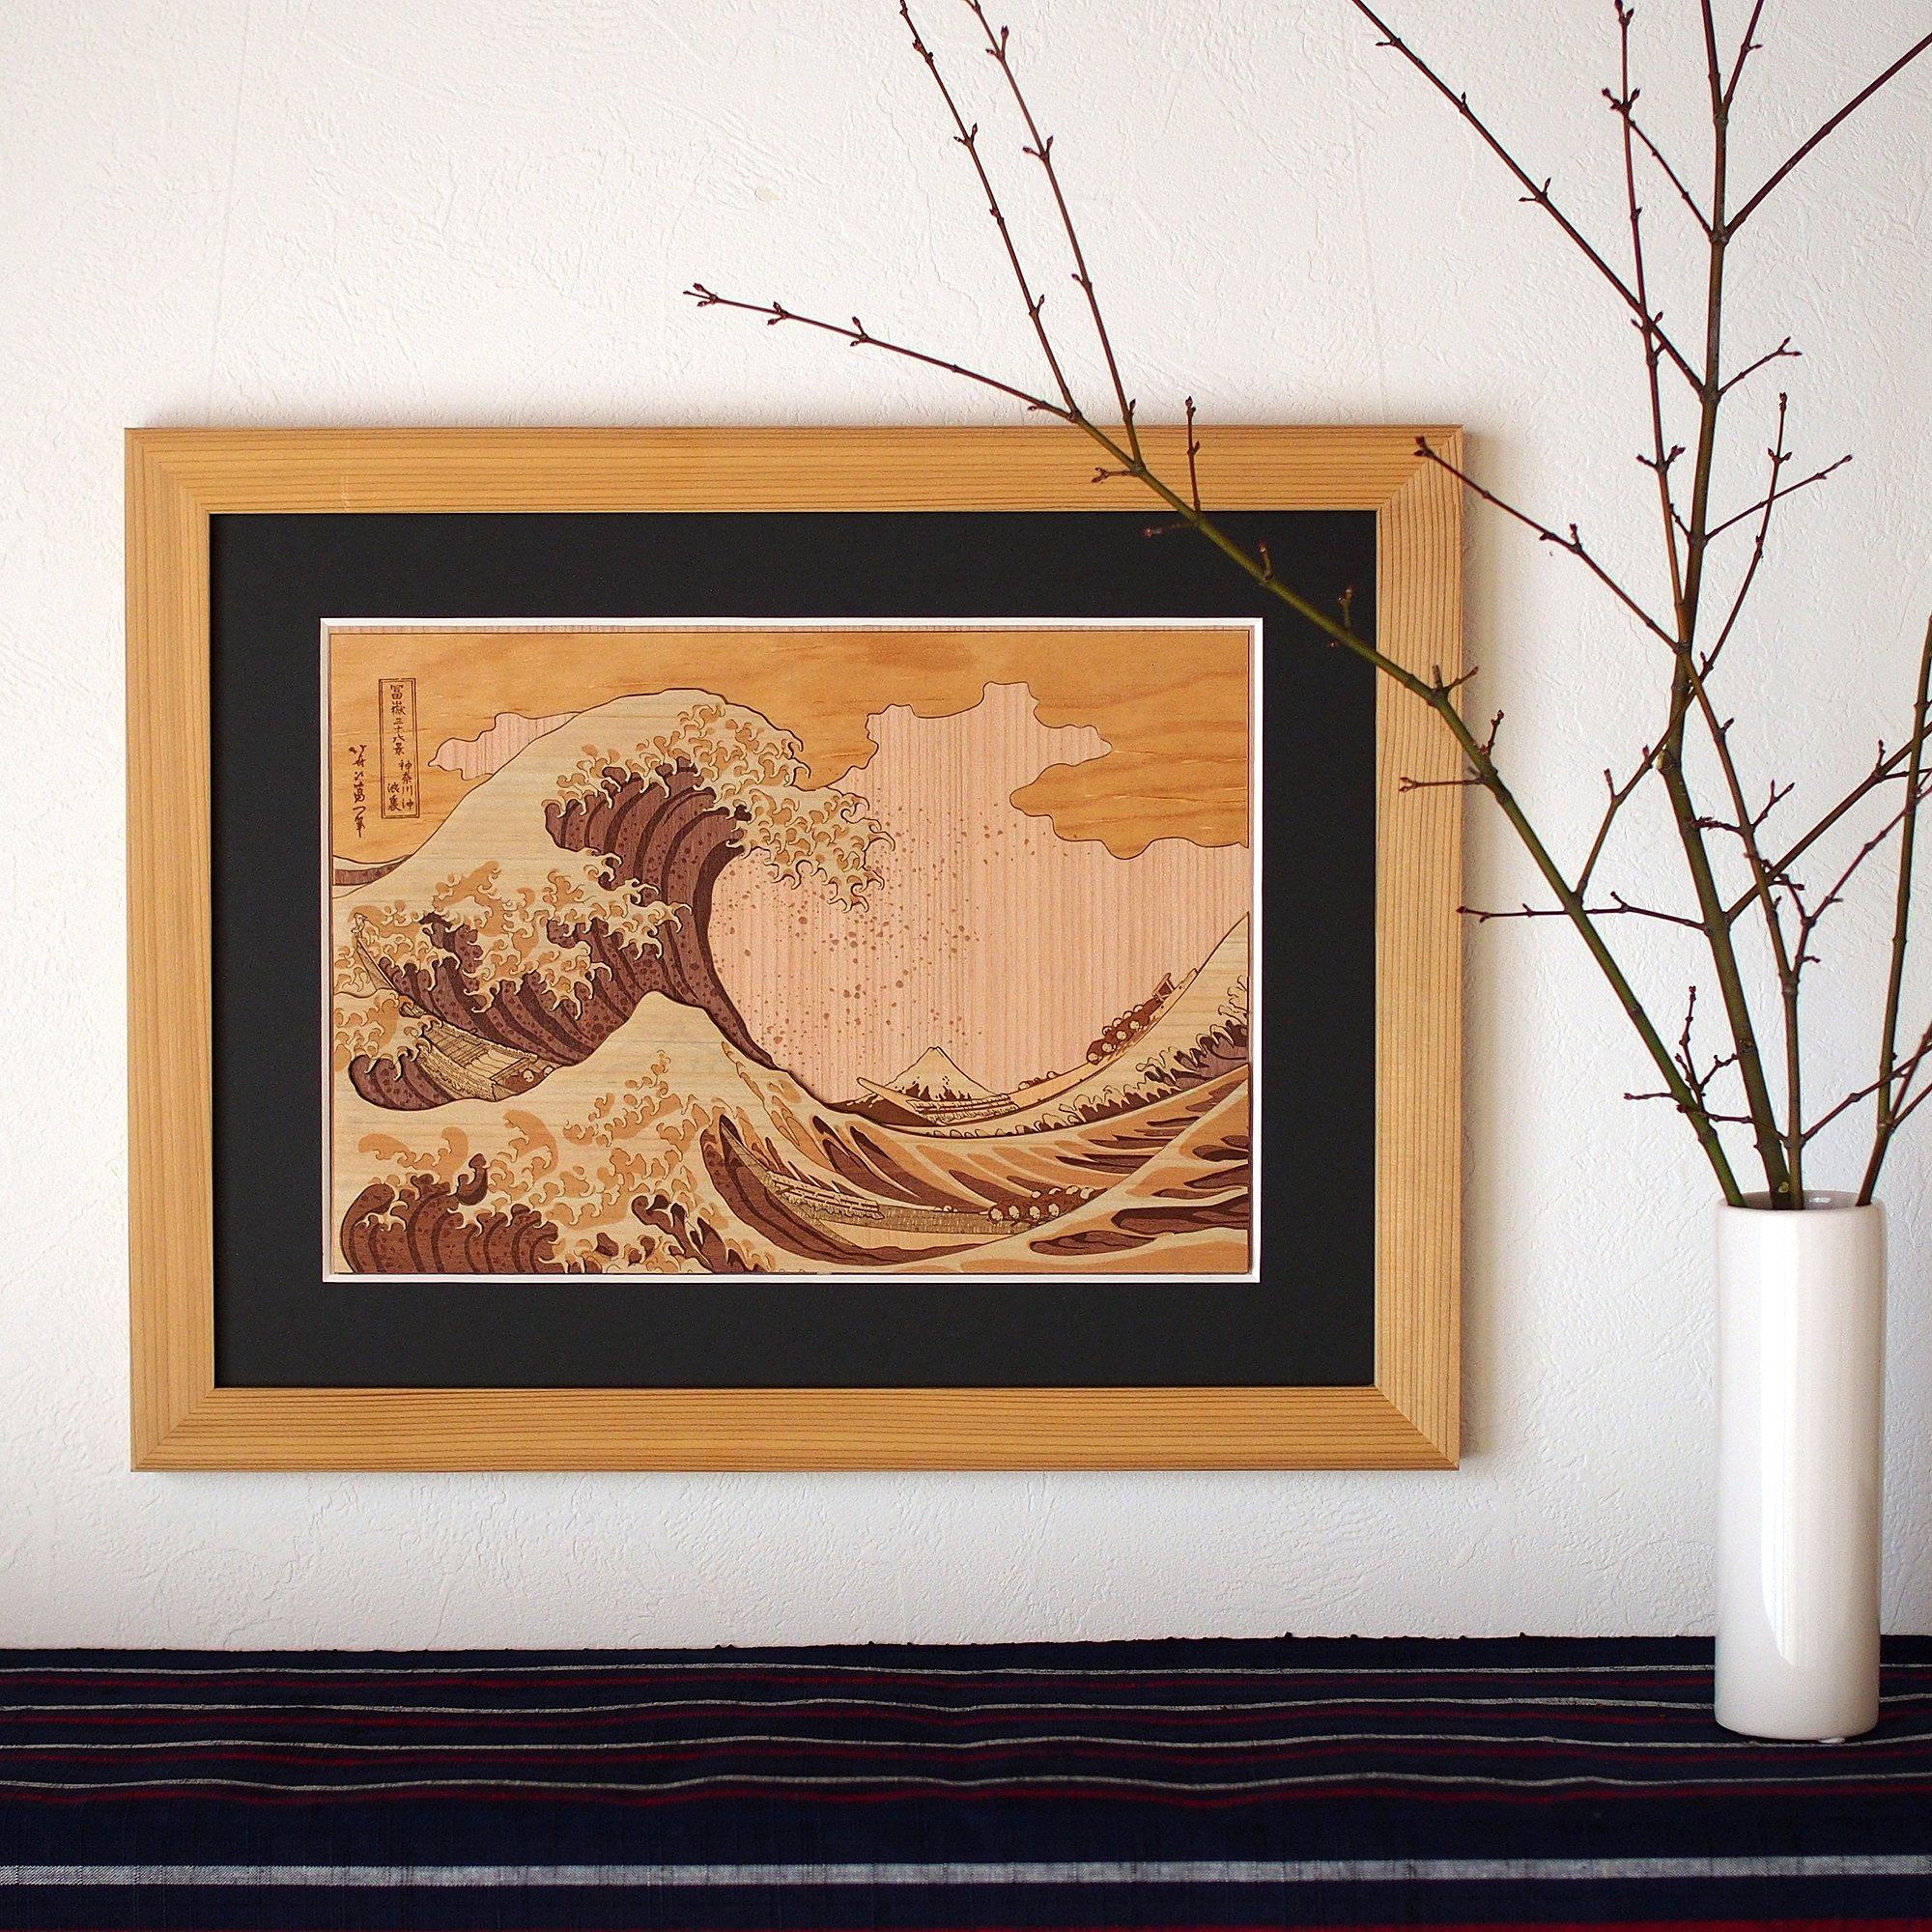 KINOWA Ukiyoe Art Kit Kiharie The Great Wave Off Kanagawa Thirty-six Views of Mount Fuji by Hokusai Made in Japan by KINOWA (Image #4)